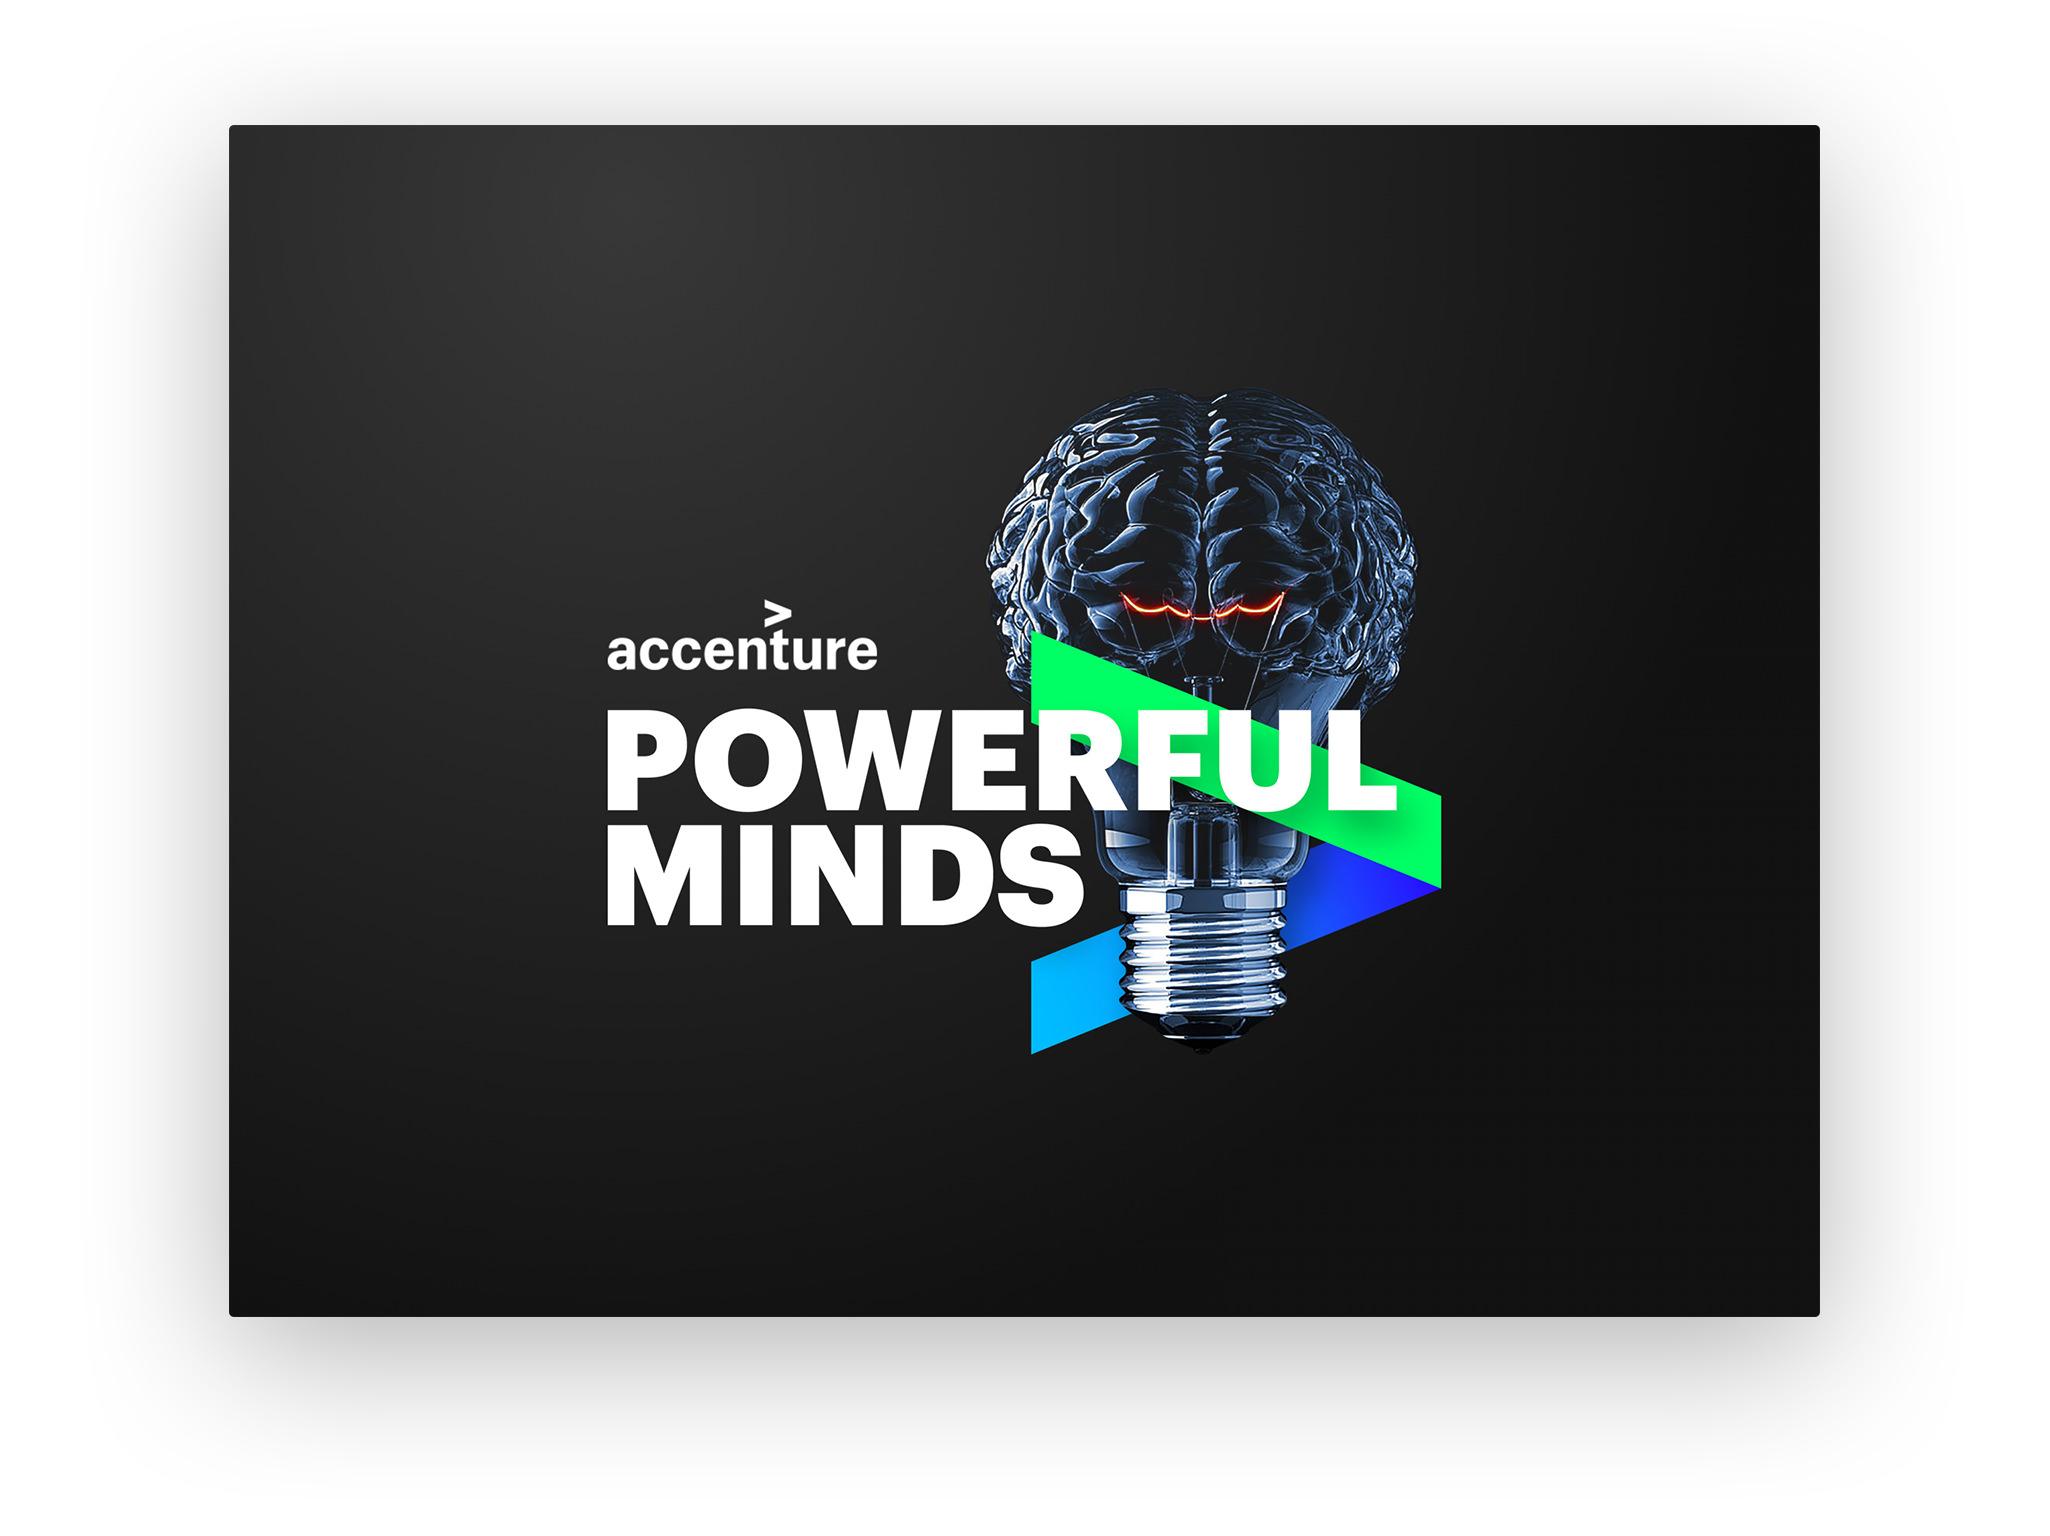 DJWFolio-Digital_PowerfulMindsUI_Screen1